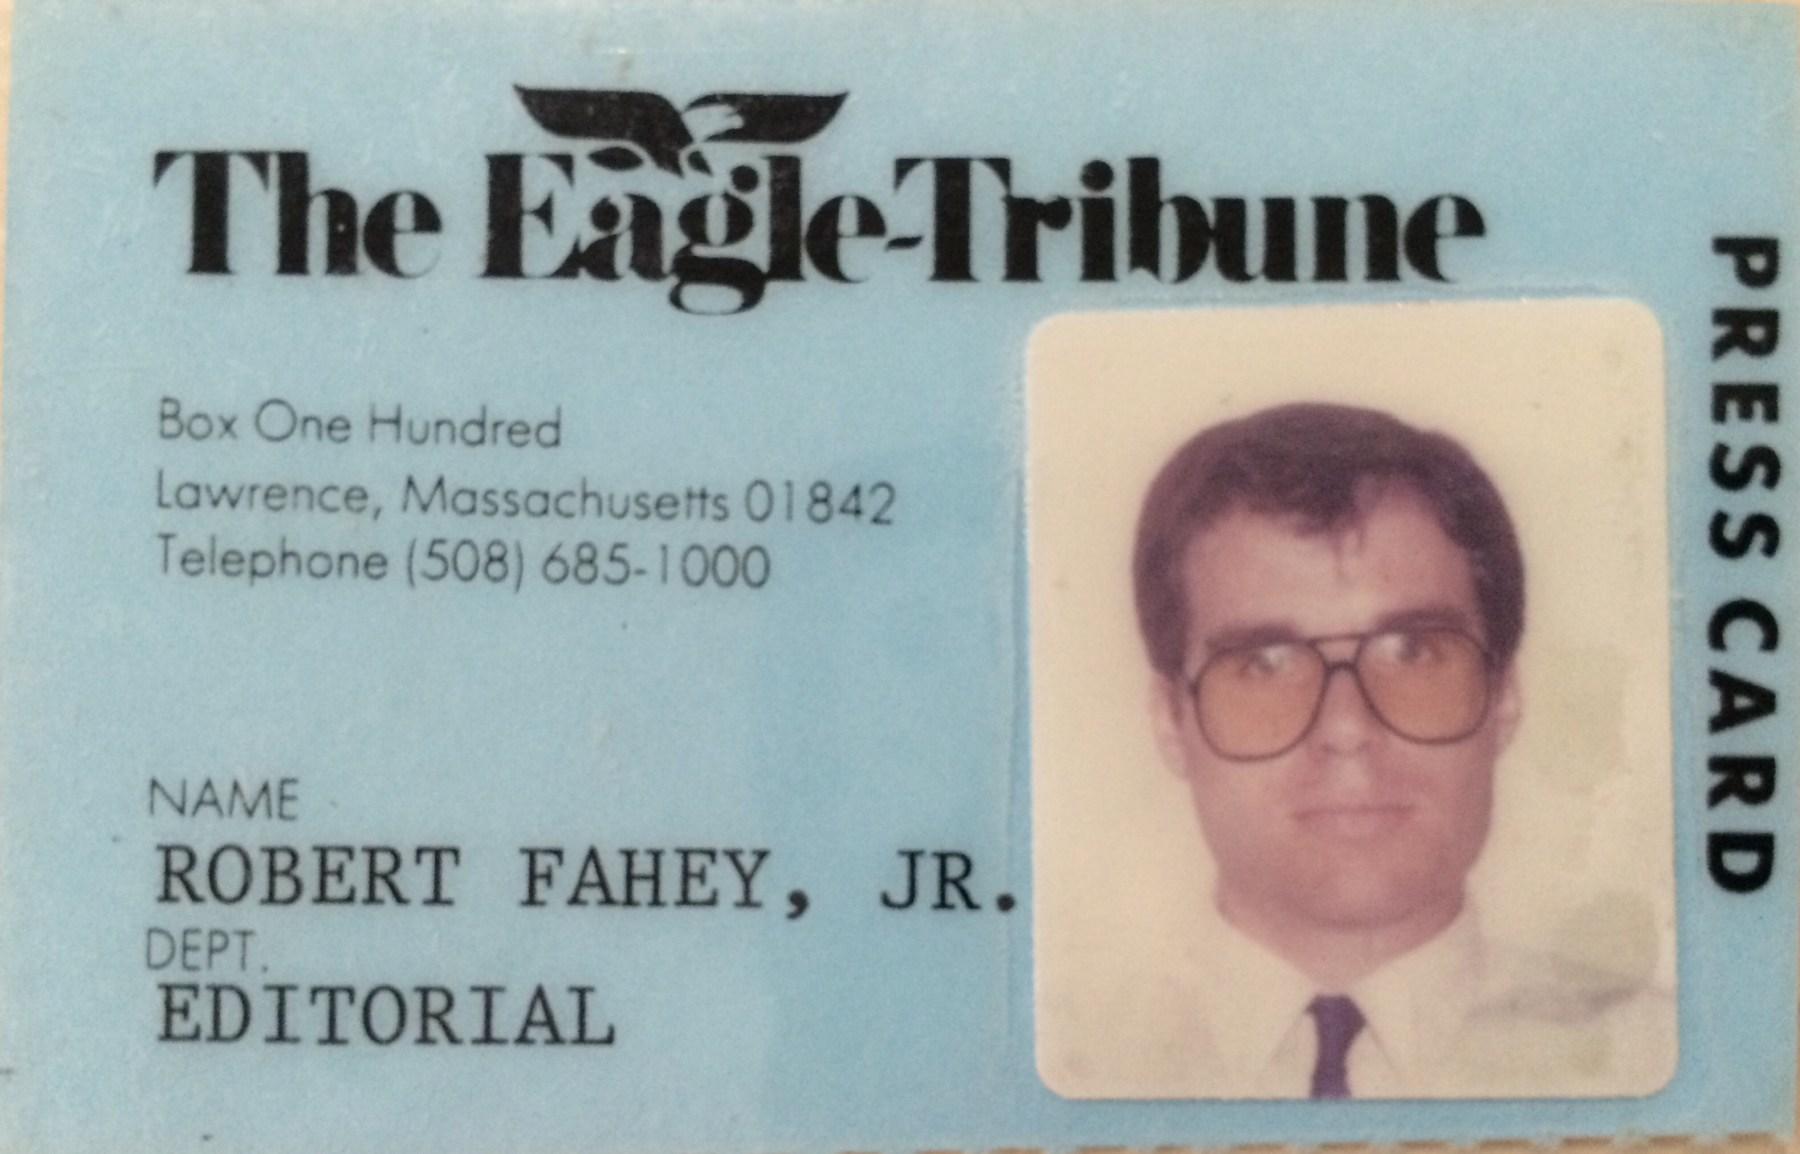 Robert Fahey Eagle Tribune press pass